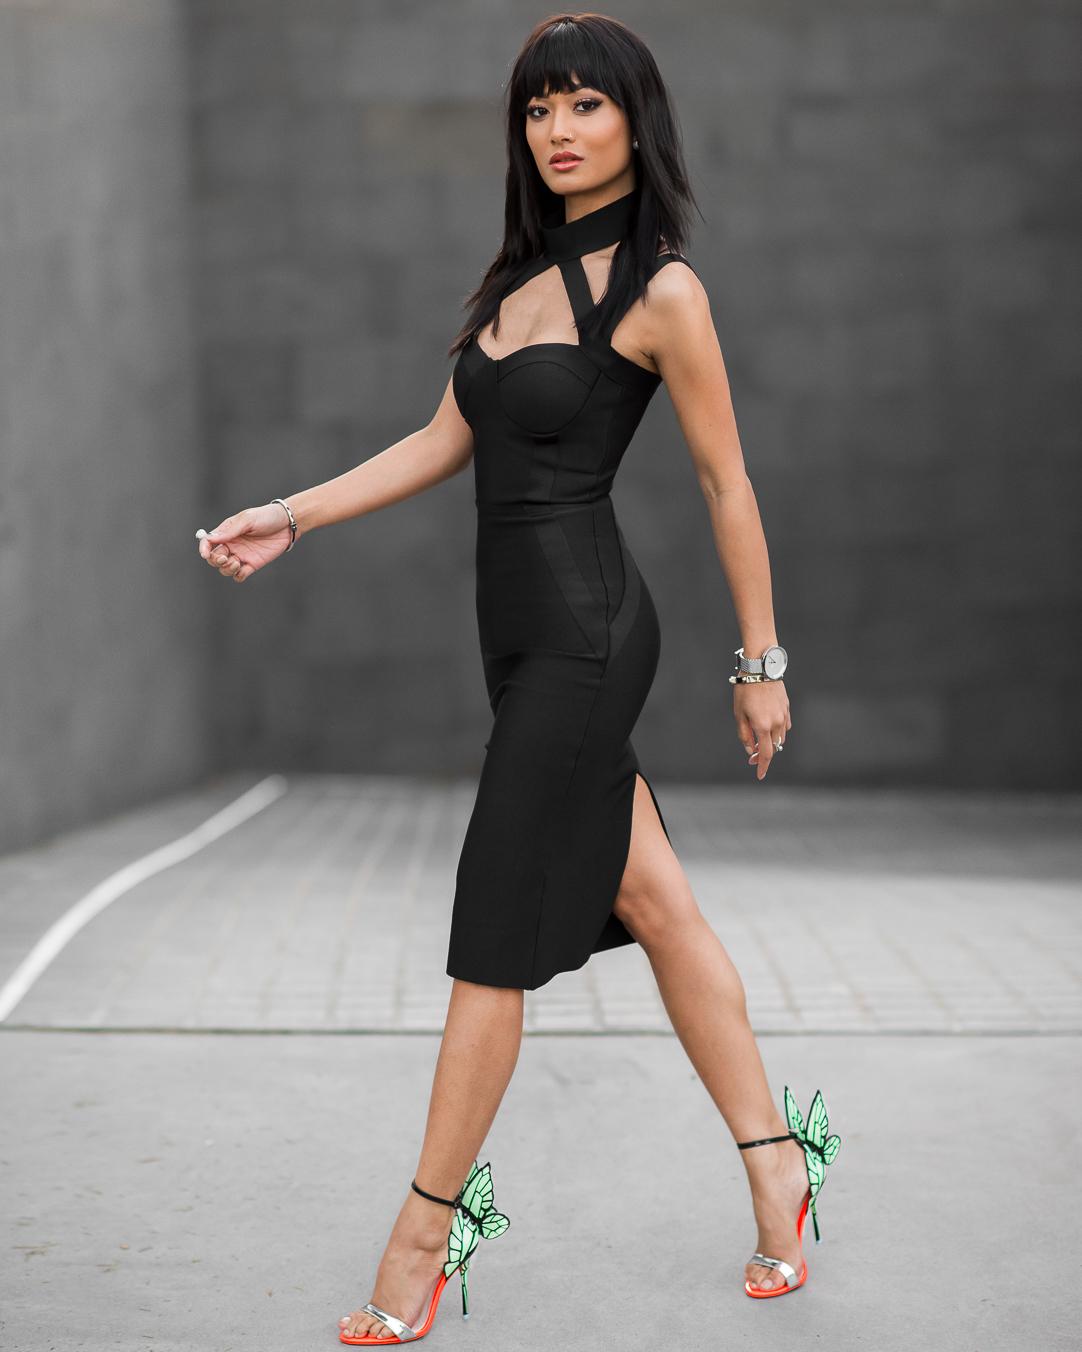 Micah-Gianneli-Sophia-Webster-Luisaviaroma-Posh-Shop-Chiara-Wing-Sandals-Street-Style-Editorial-7.jpg